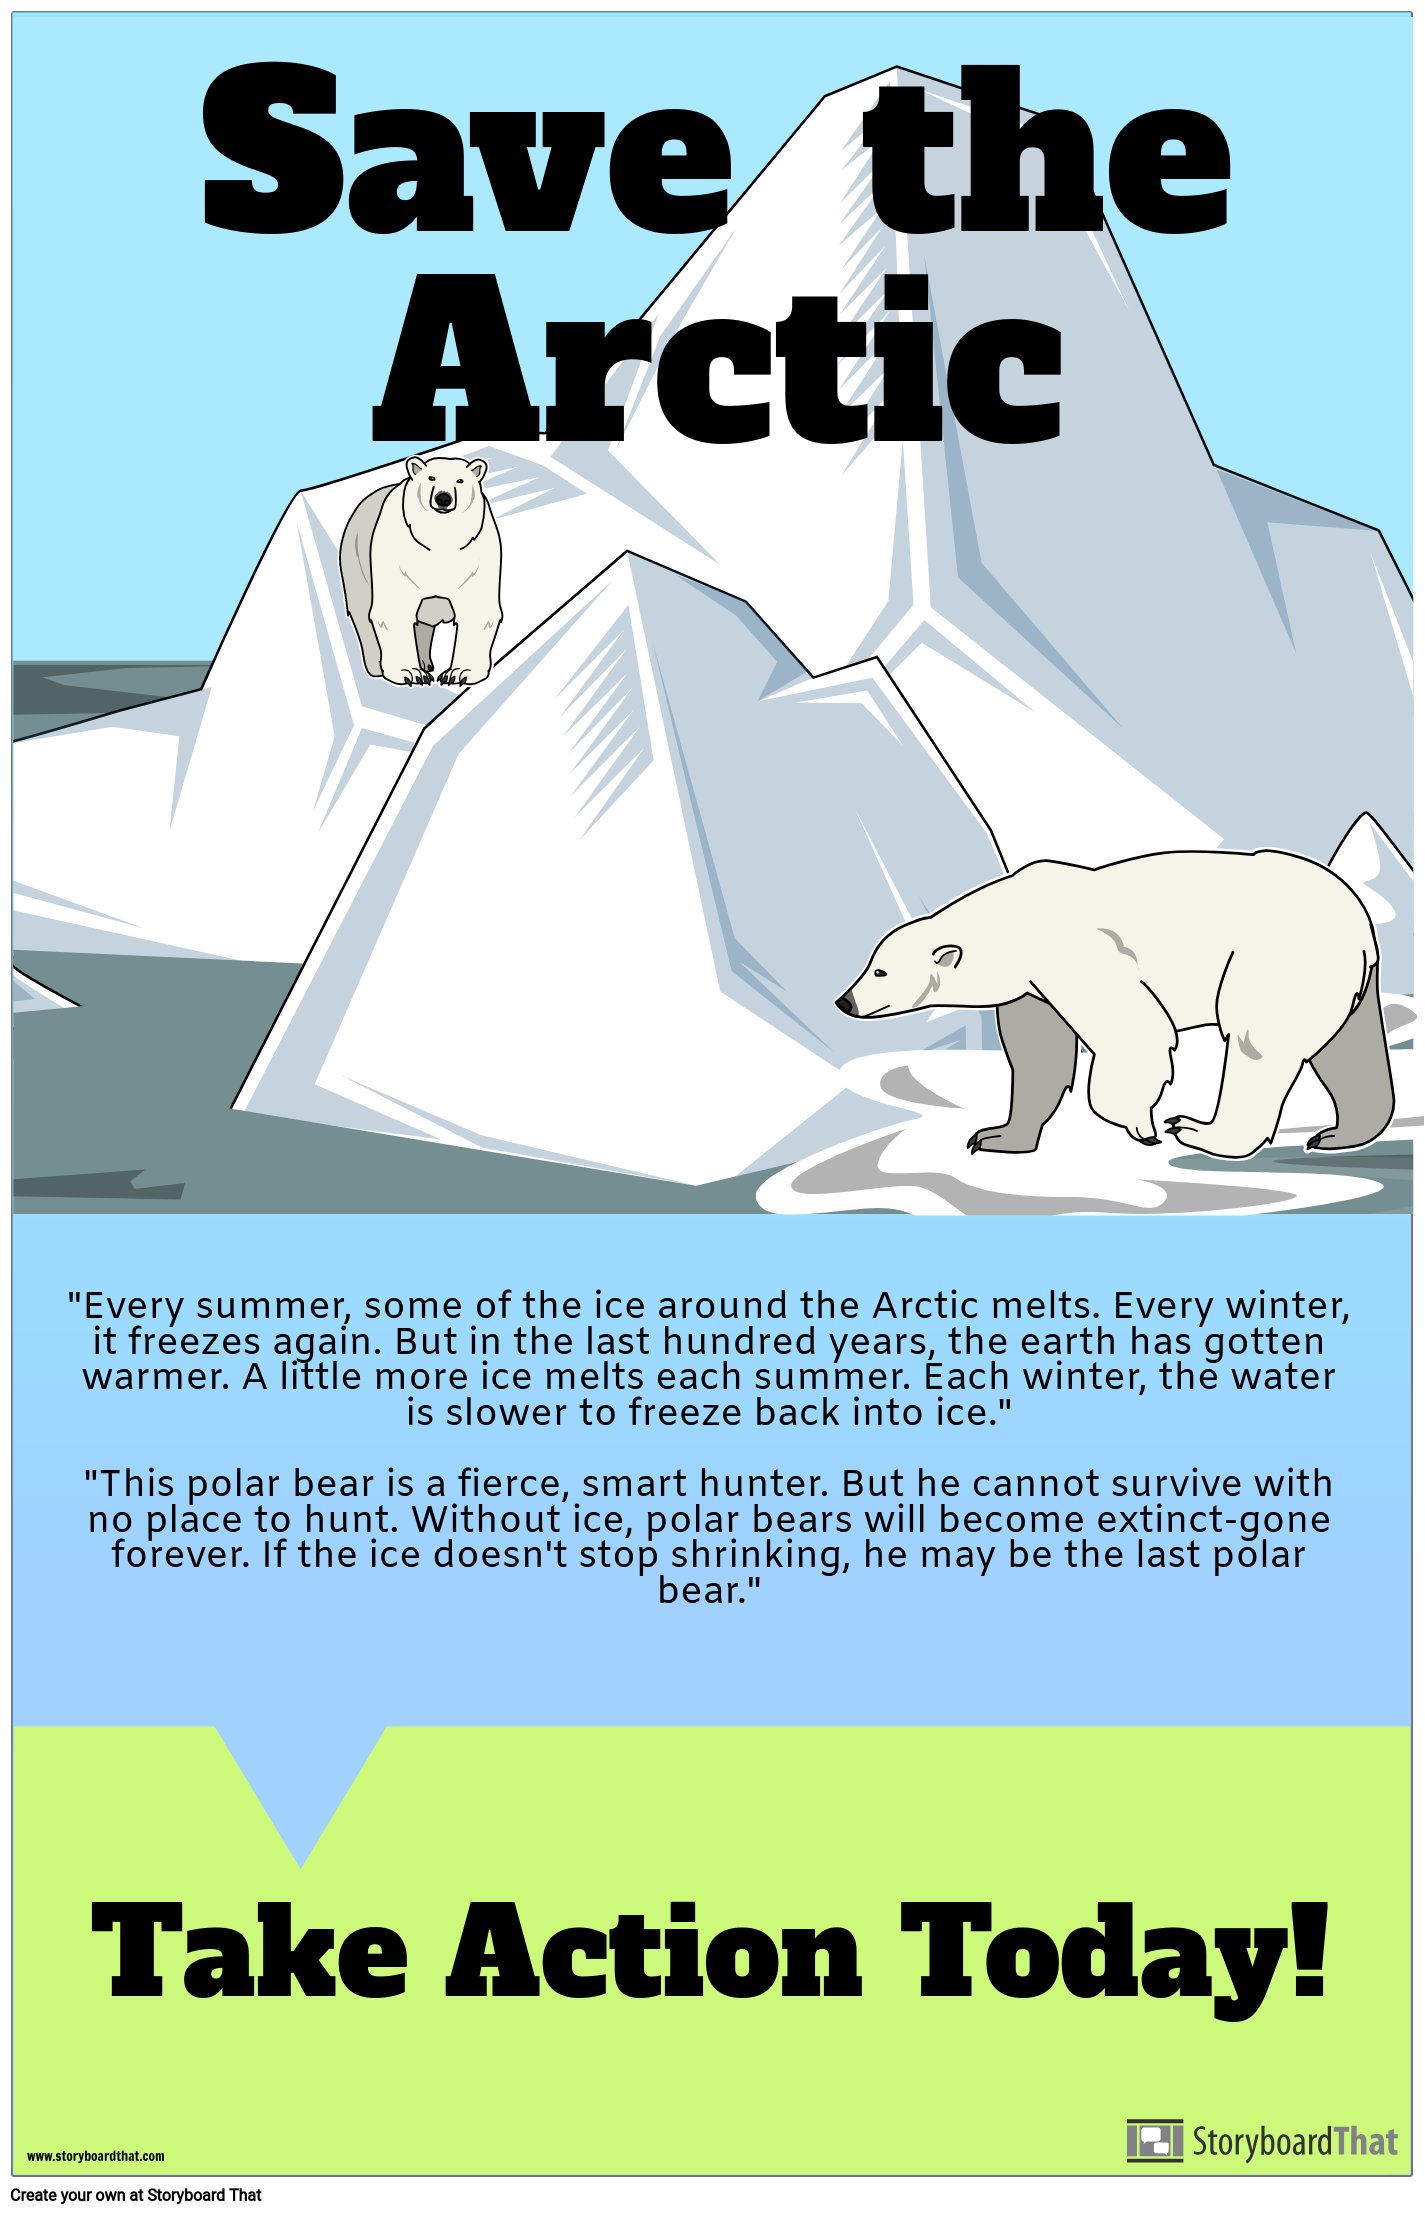 Will polar bears become extinct?